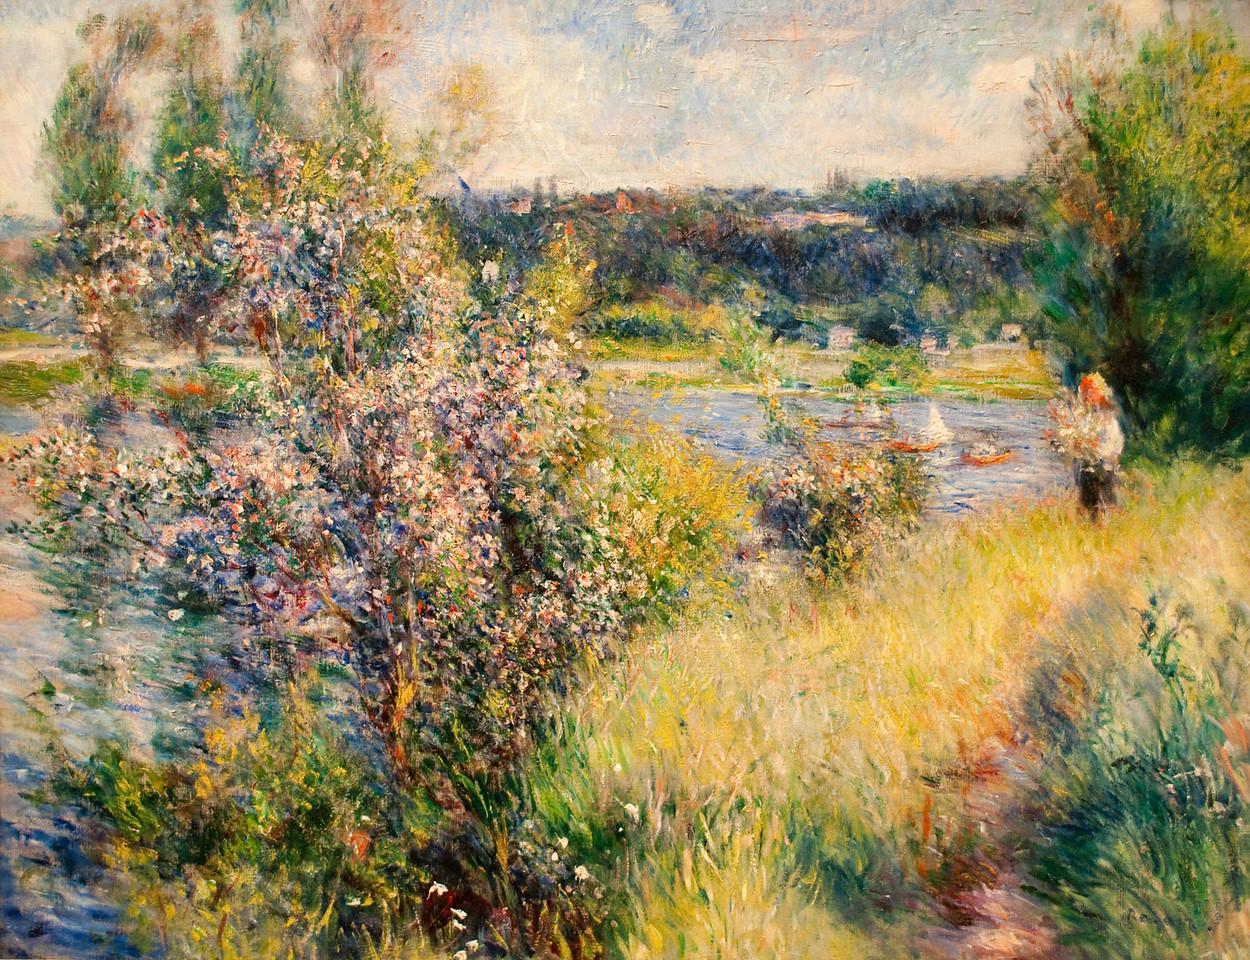 Pierre-Auguste Renoir<br /> The Seine at Chatou<br /> 1881